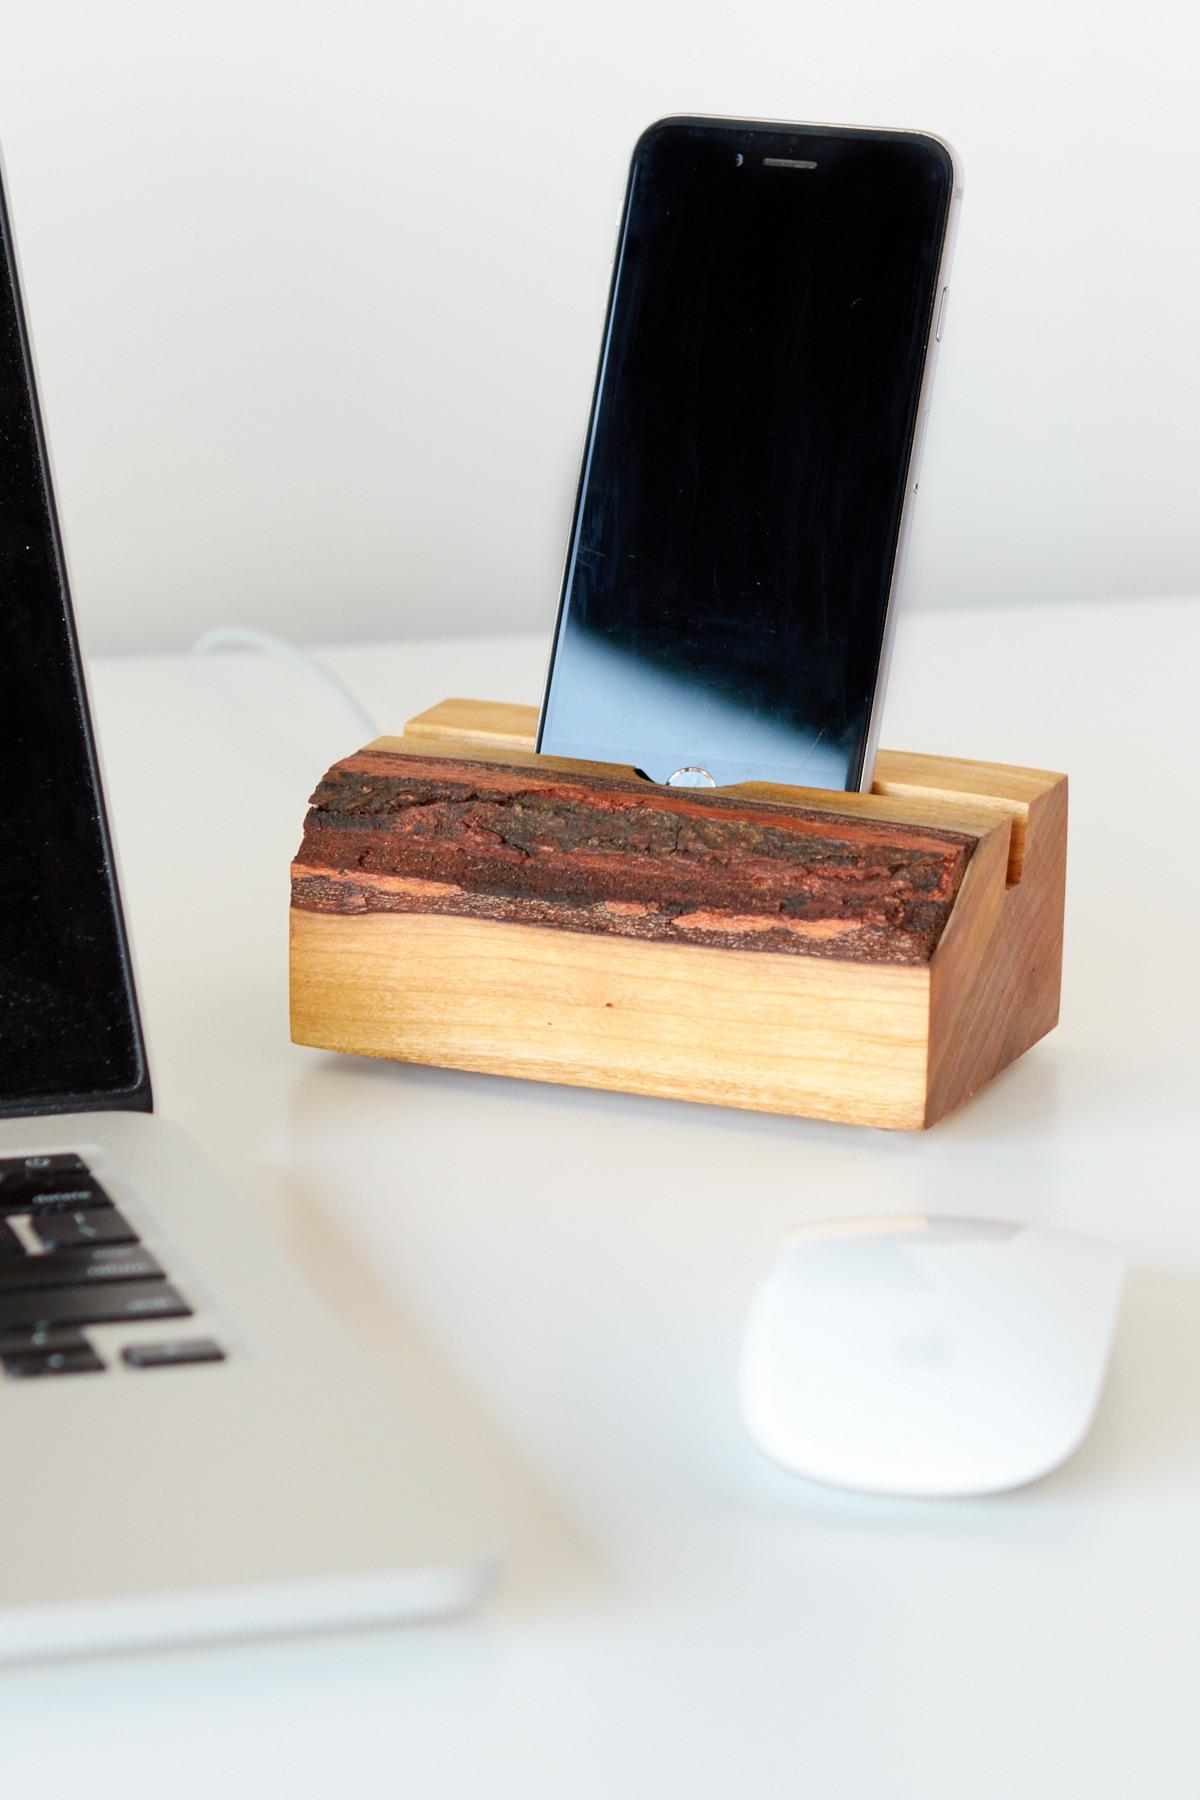 DIY Wood slab phone charger dock